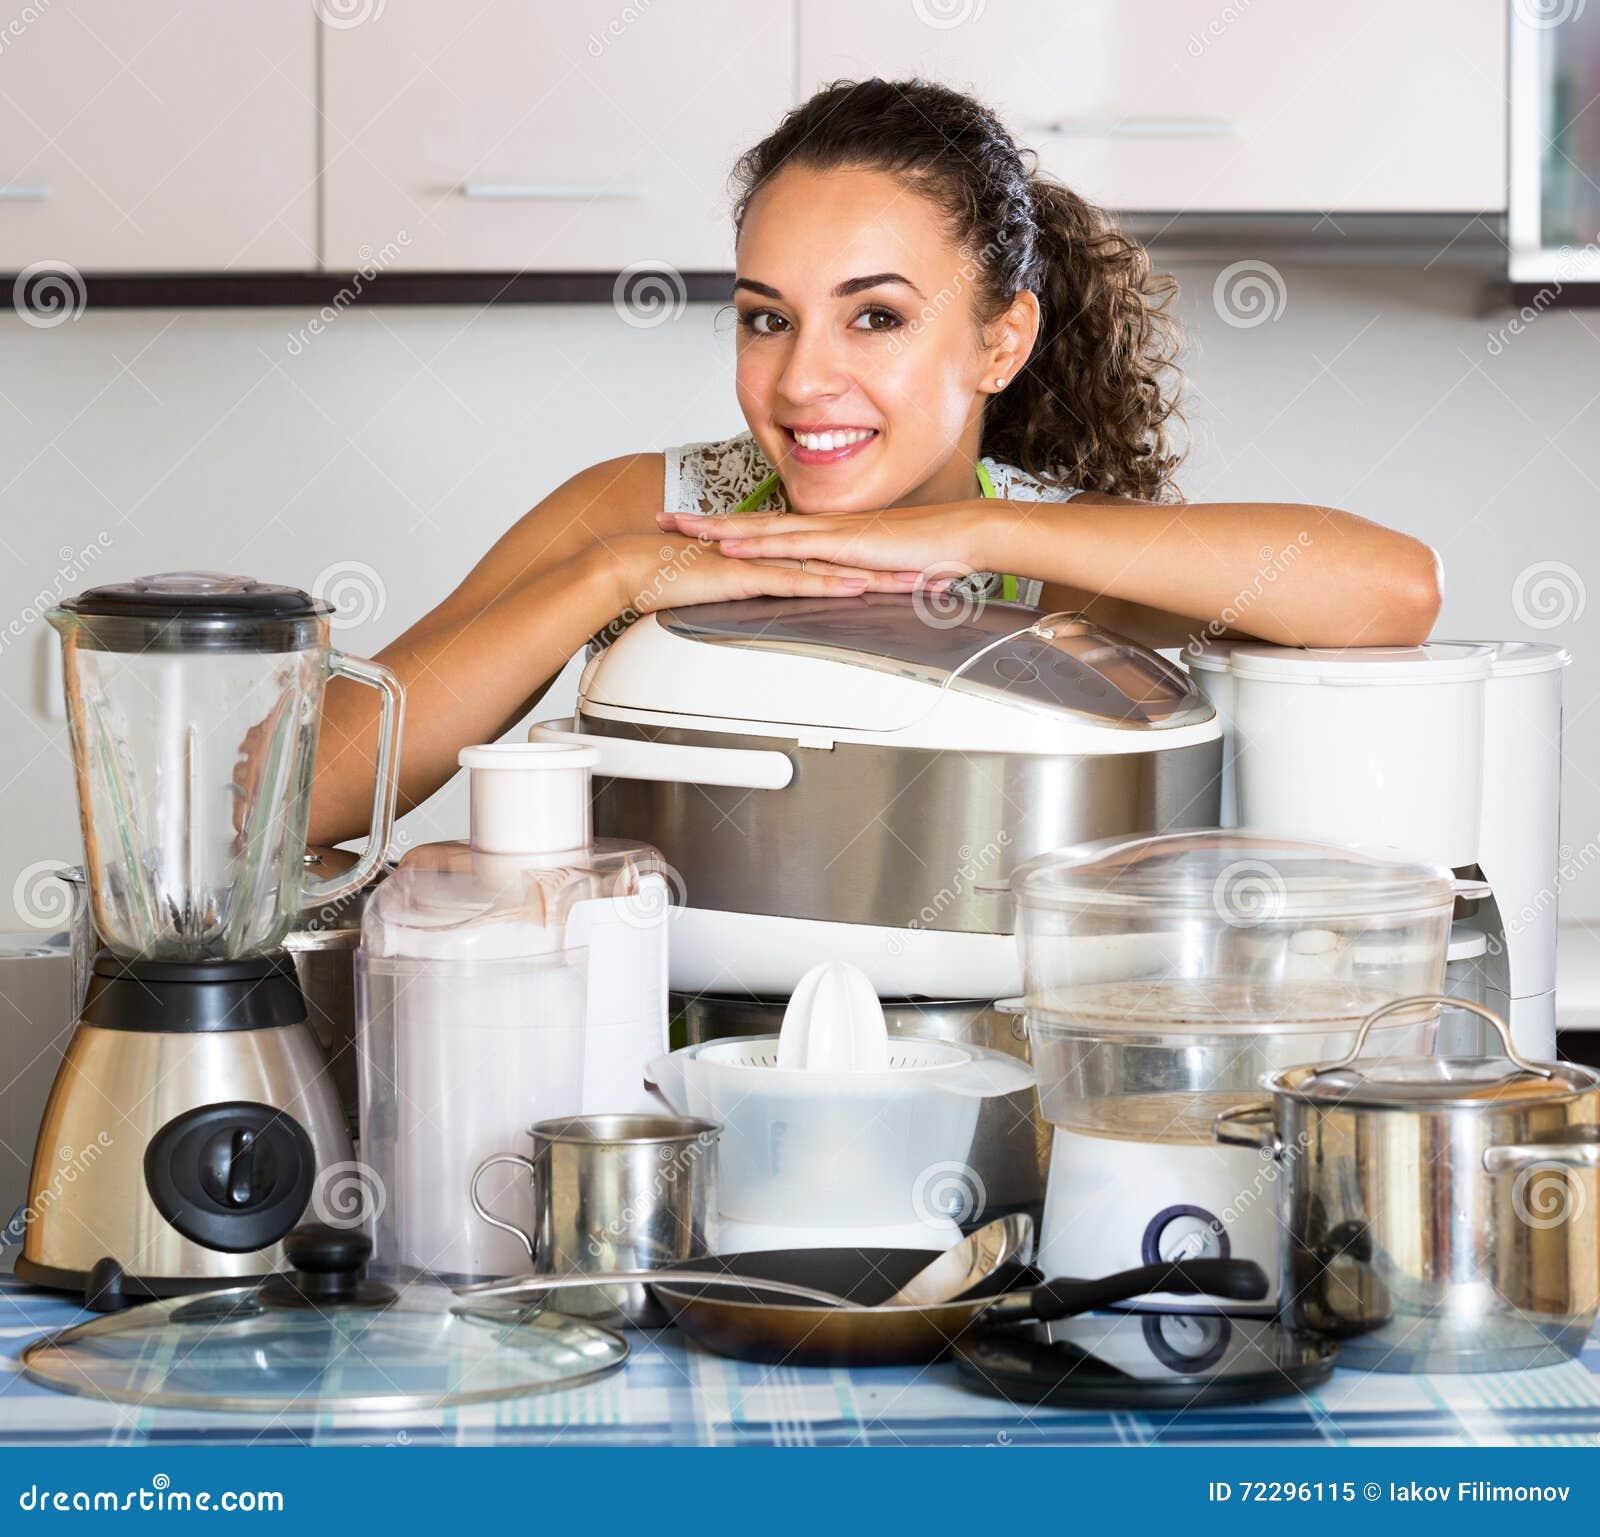 Download Домохозяйка с Multicooker и приборами Стоковое Изображение - изображение насчитывающей кашевар, lifestyle: 72296115